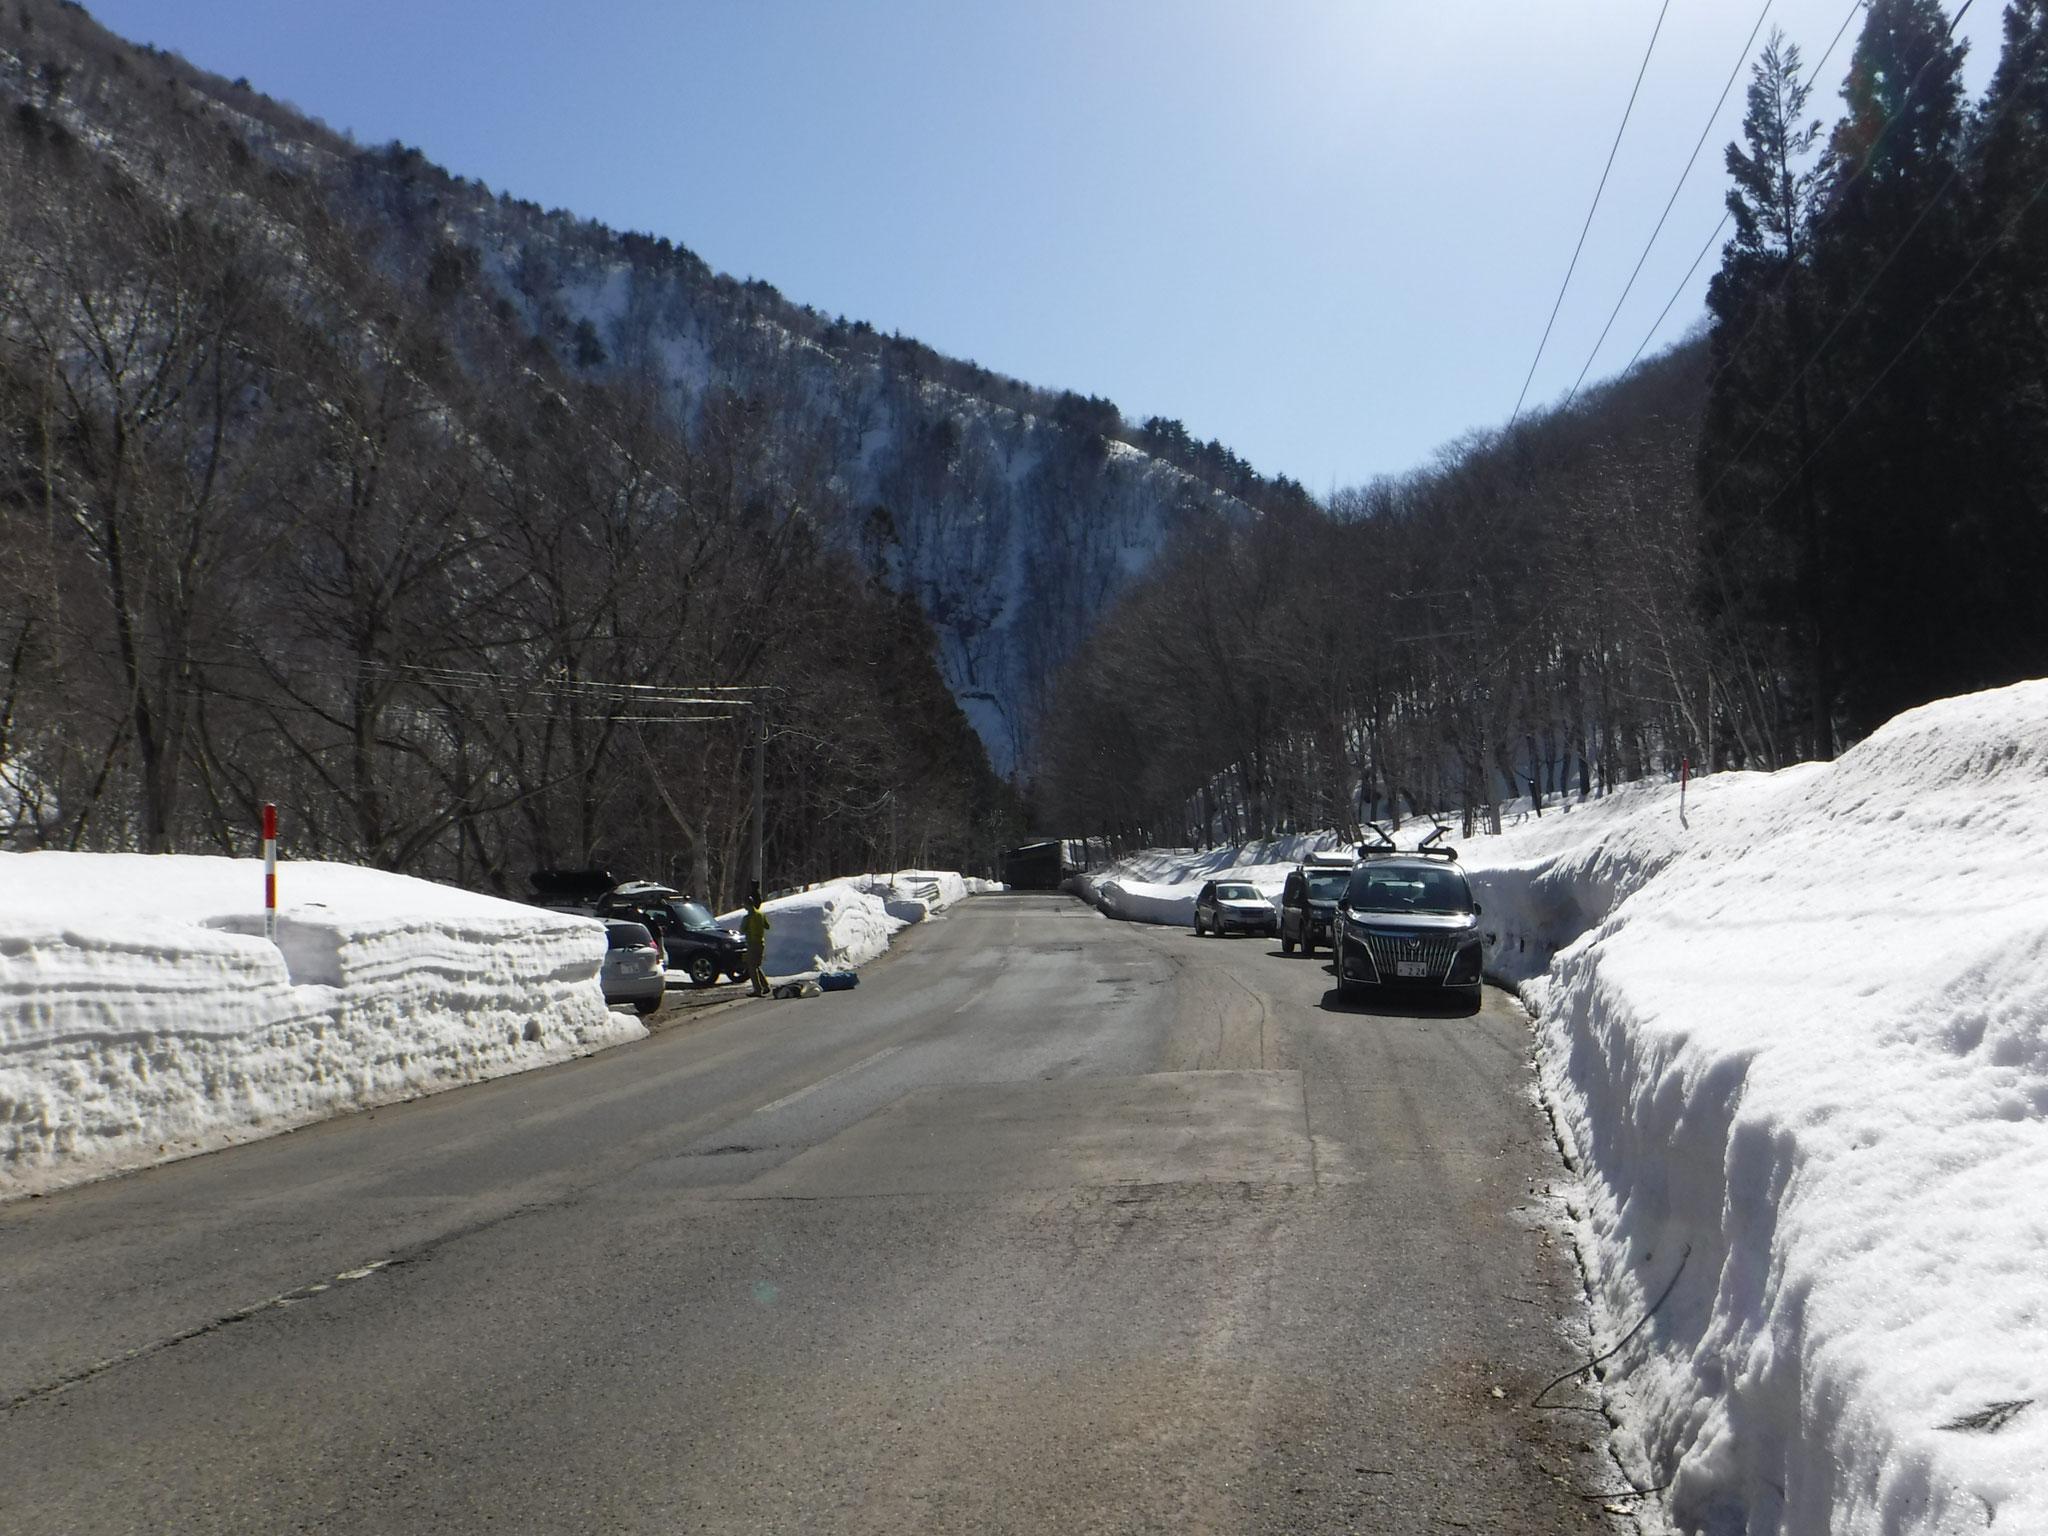 13:35 三岩岳登山口